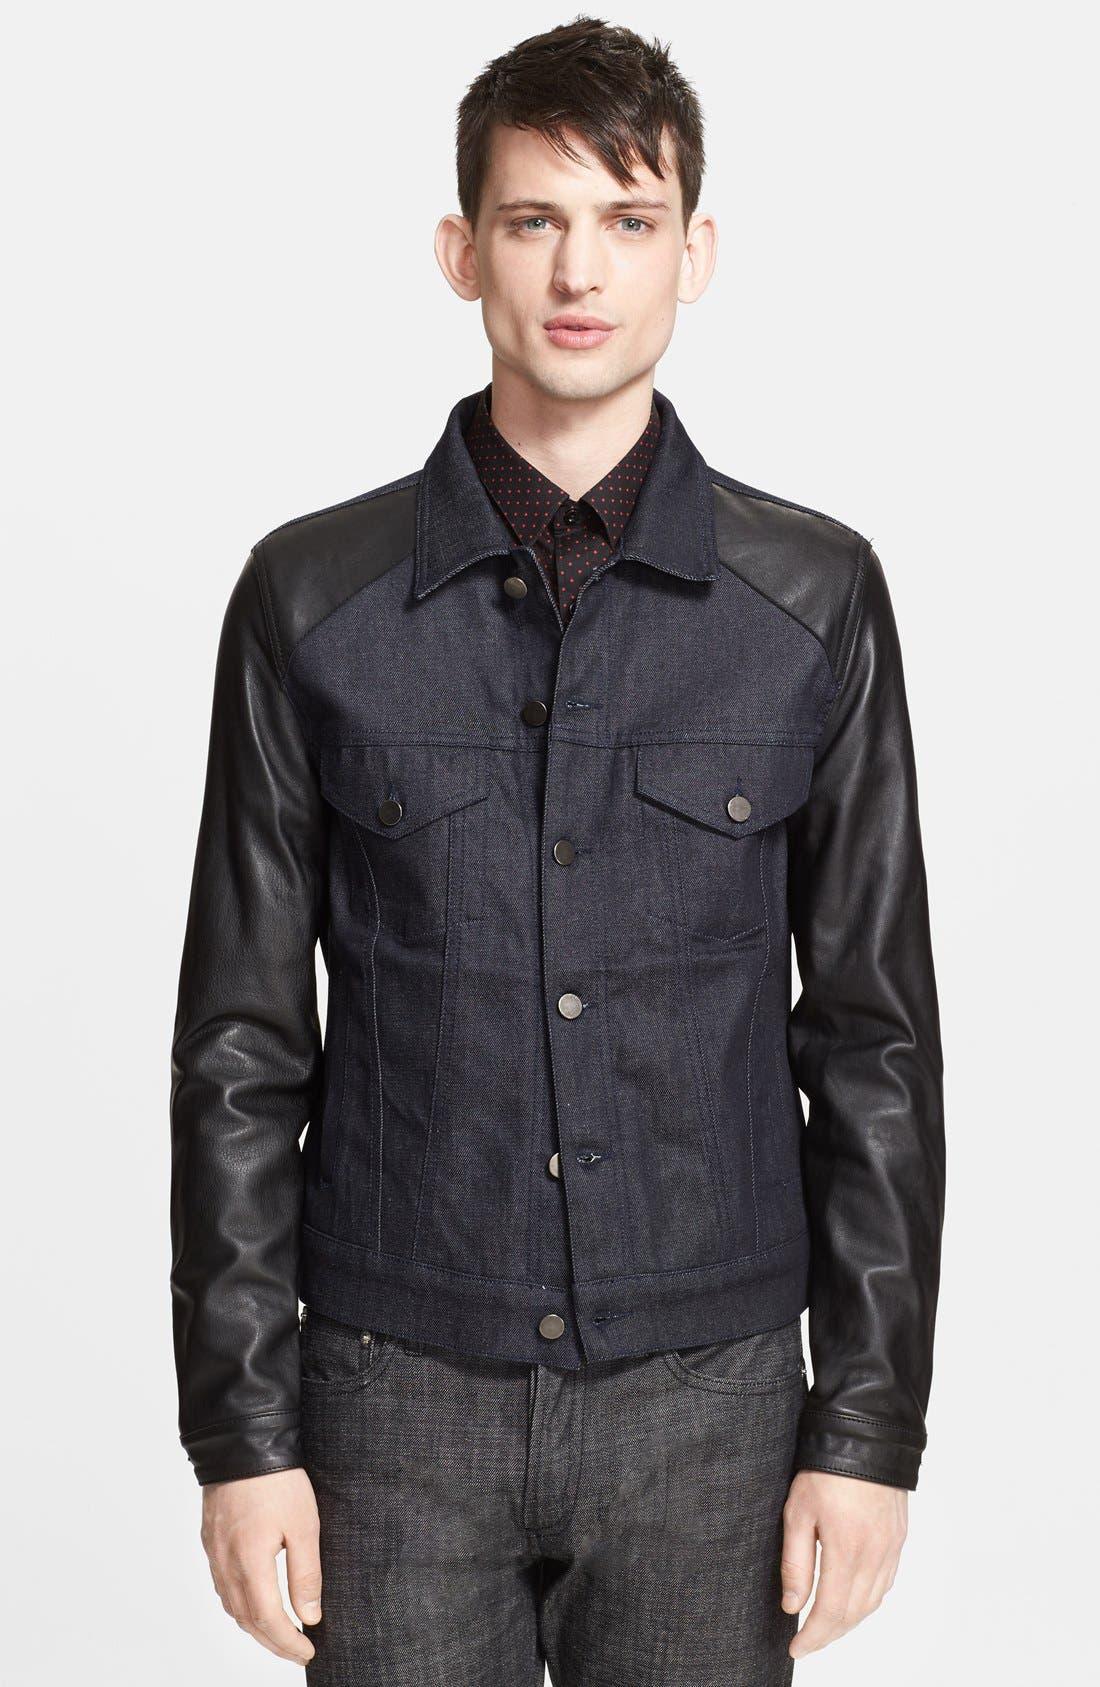 Alternate Image 1 Selected - The Kooples Denim Jacket with Leather Sleeves